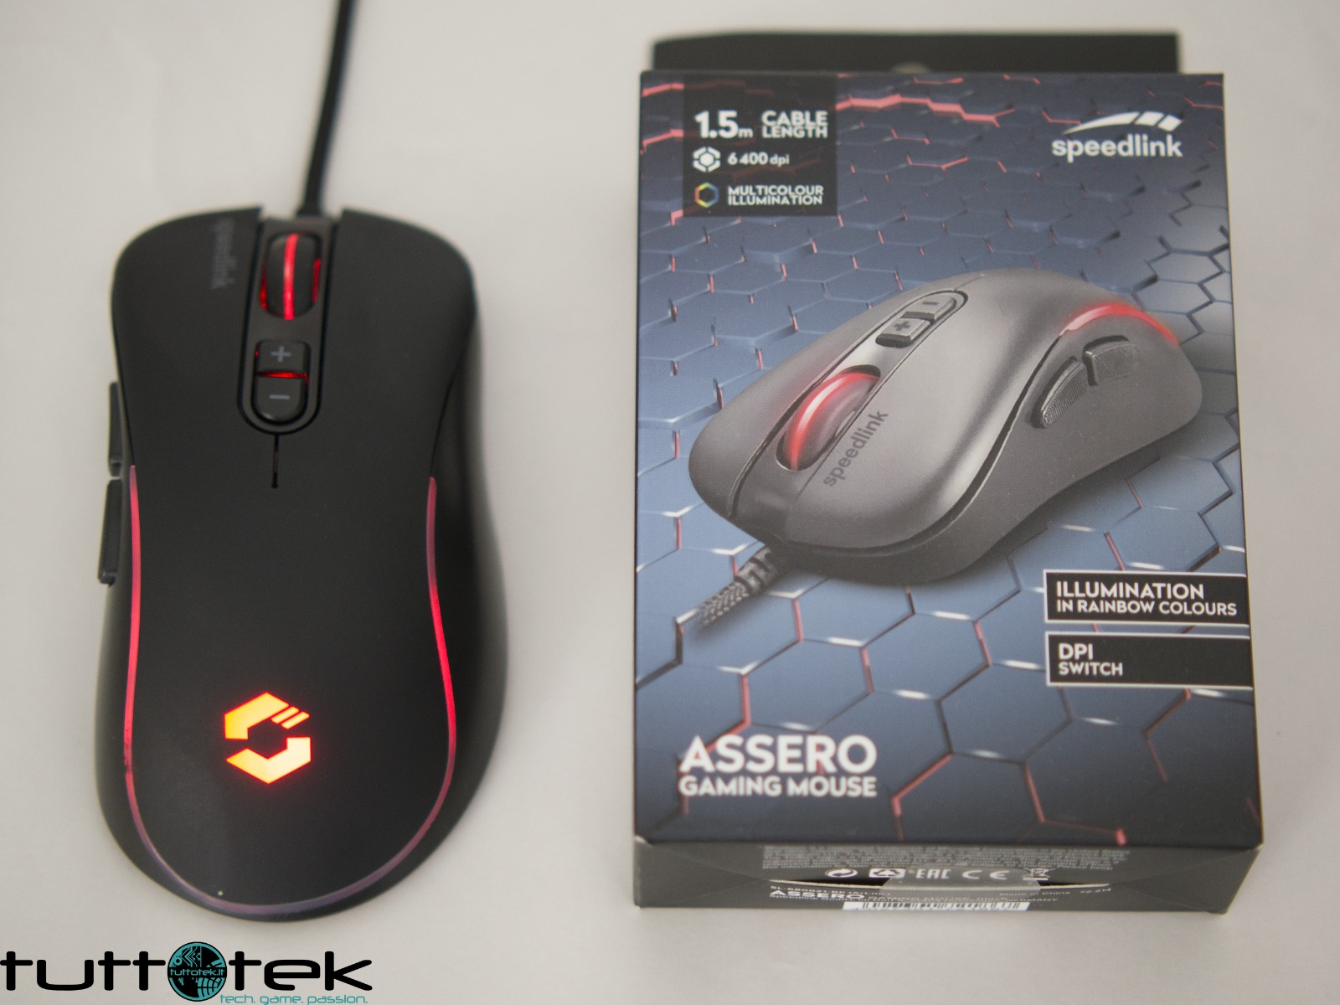 Recensione Speedlink ASSERO Gaming Mouse